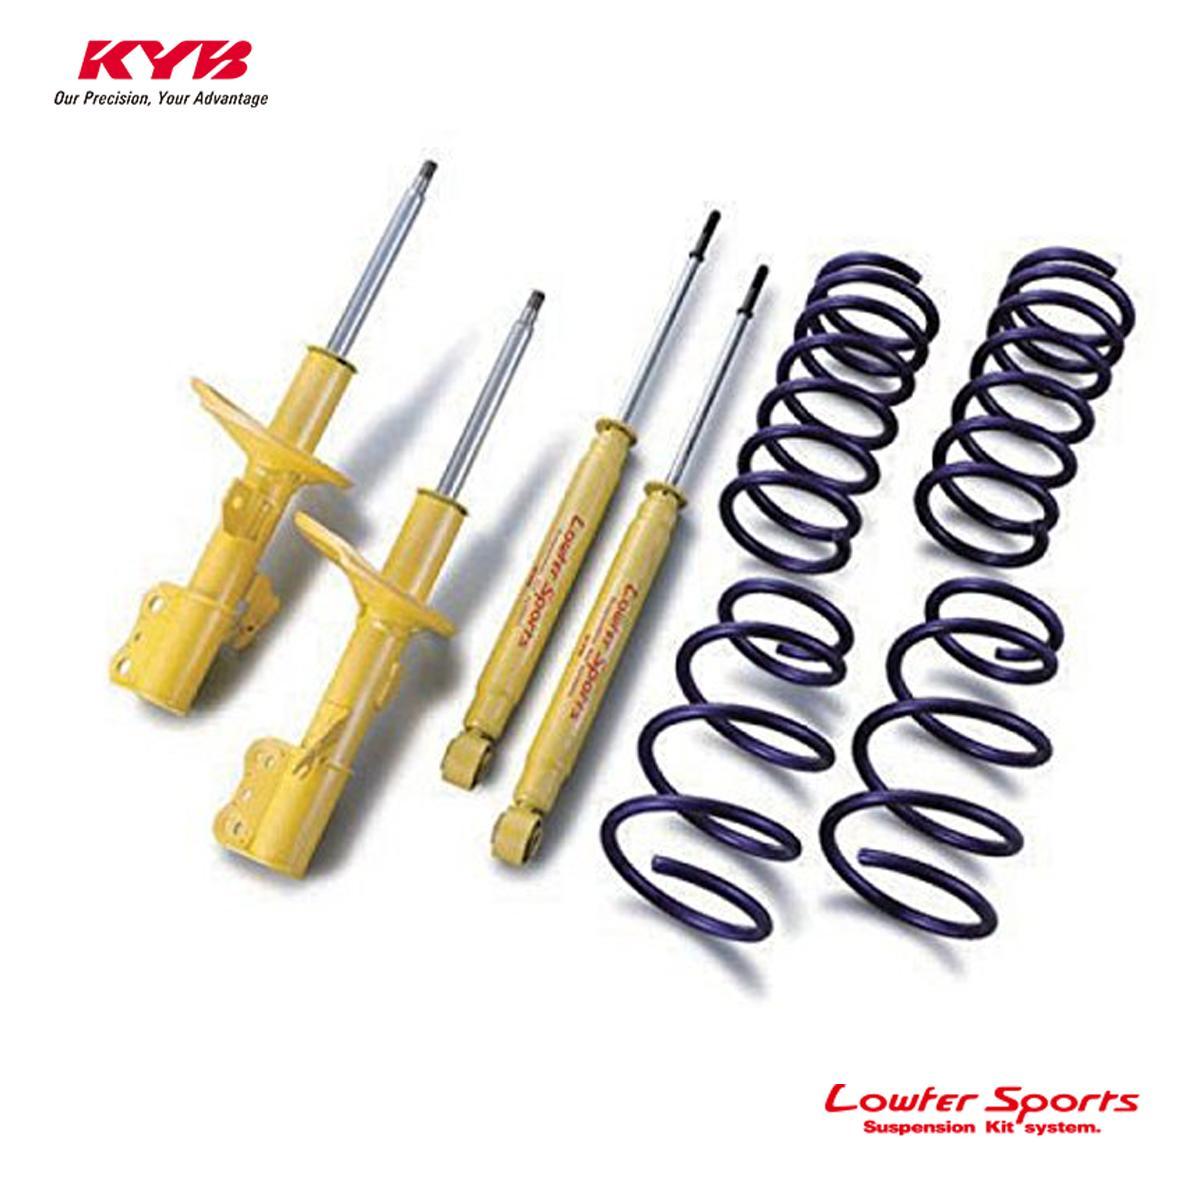 KYB カヤバ エスティマエミーナ CXR10G ショックアブソーバー サスペンションキット Lowfer Sports LKIT-TCR10G 配送先条件有り